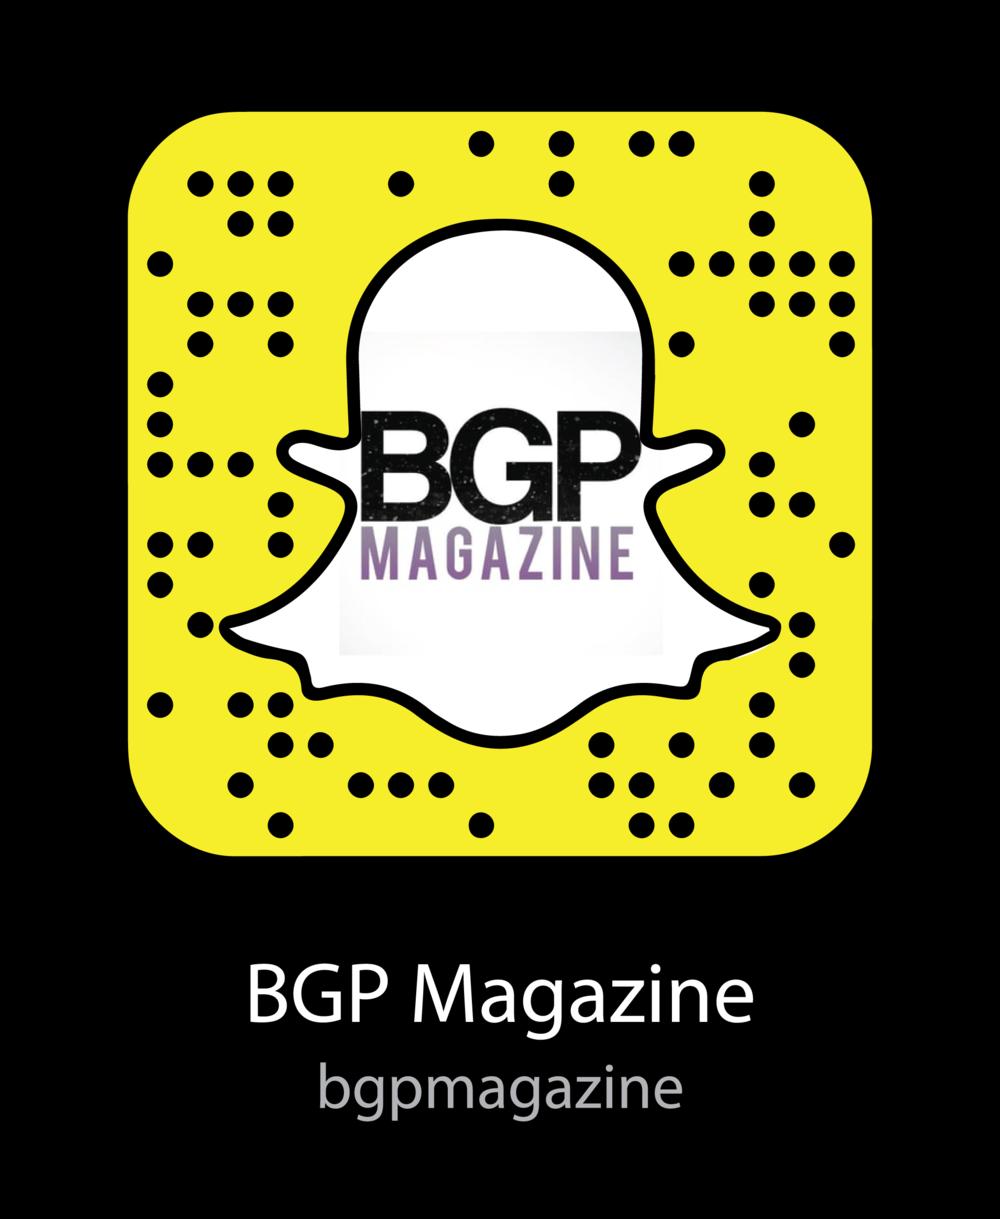 bgpmagazine-snapchat-snapcode.png